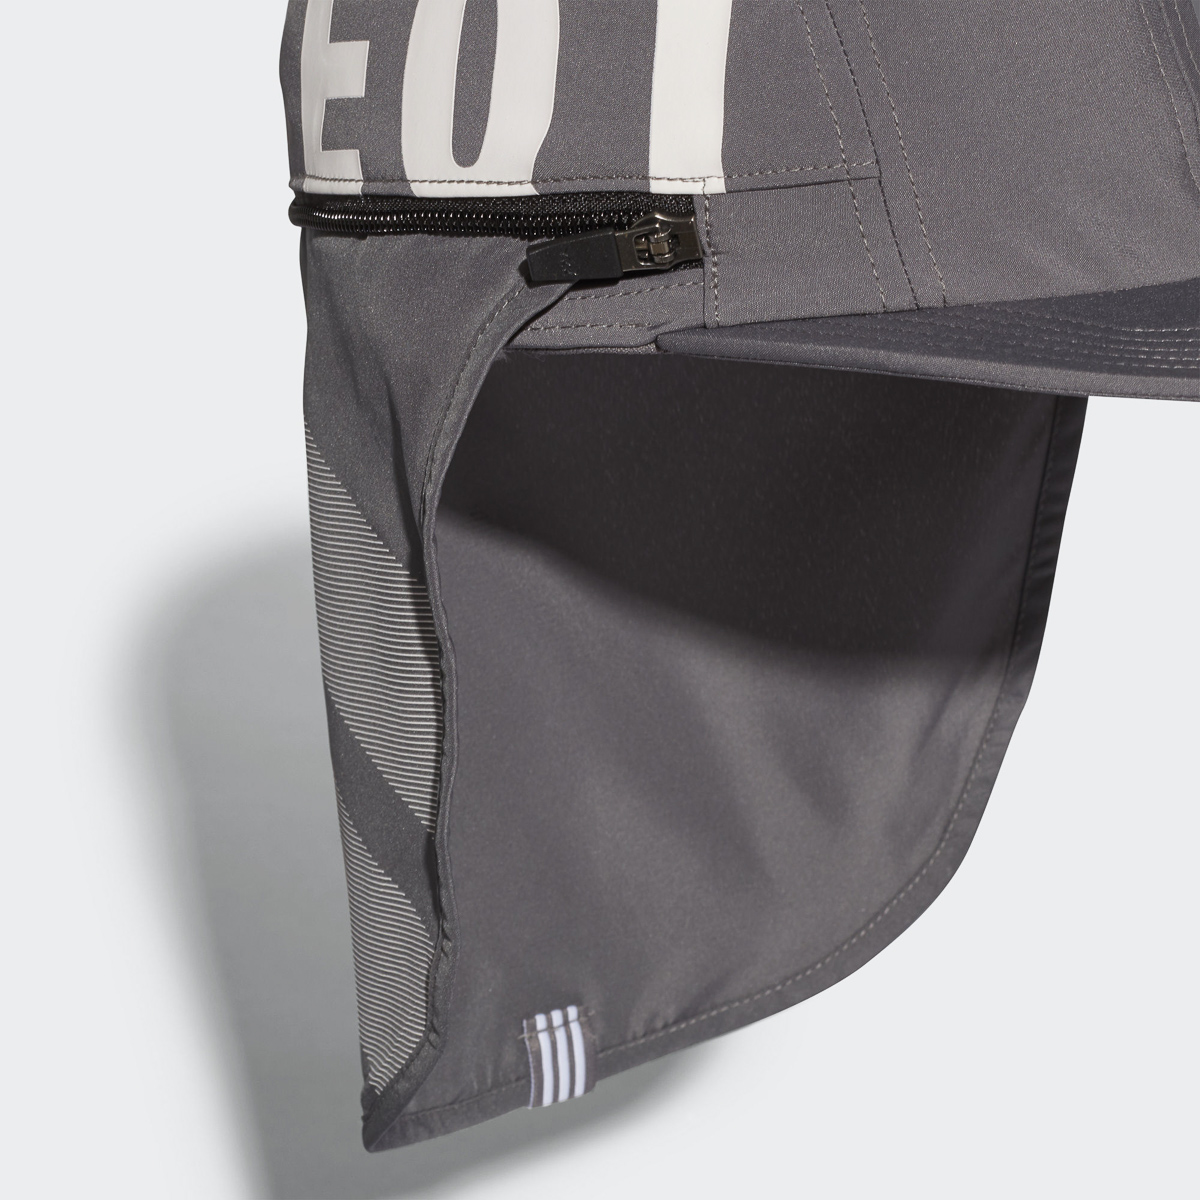 adidas EQT Four Panel Cap - Caps Snapbacks - Sporting goods  82fc3aeb02e